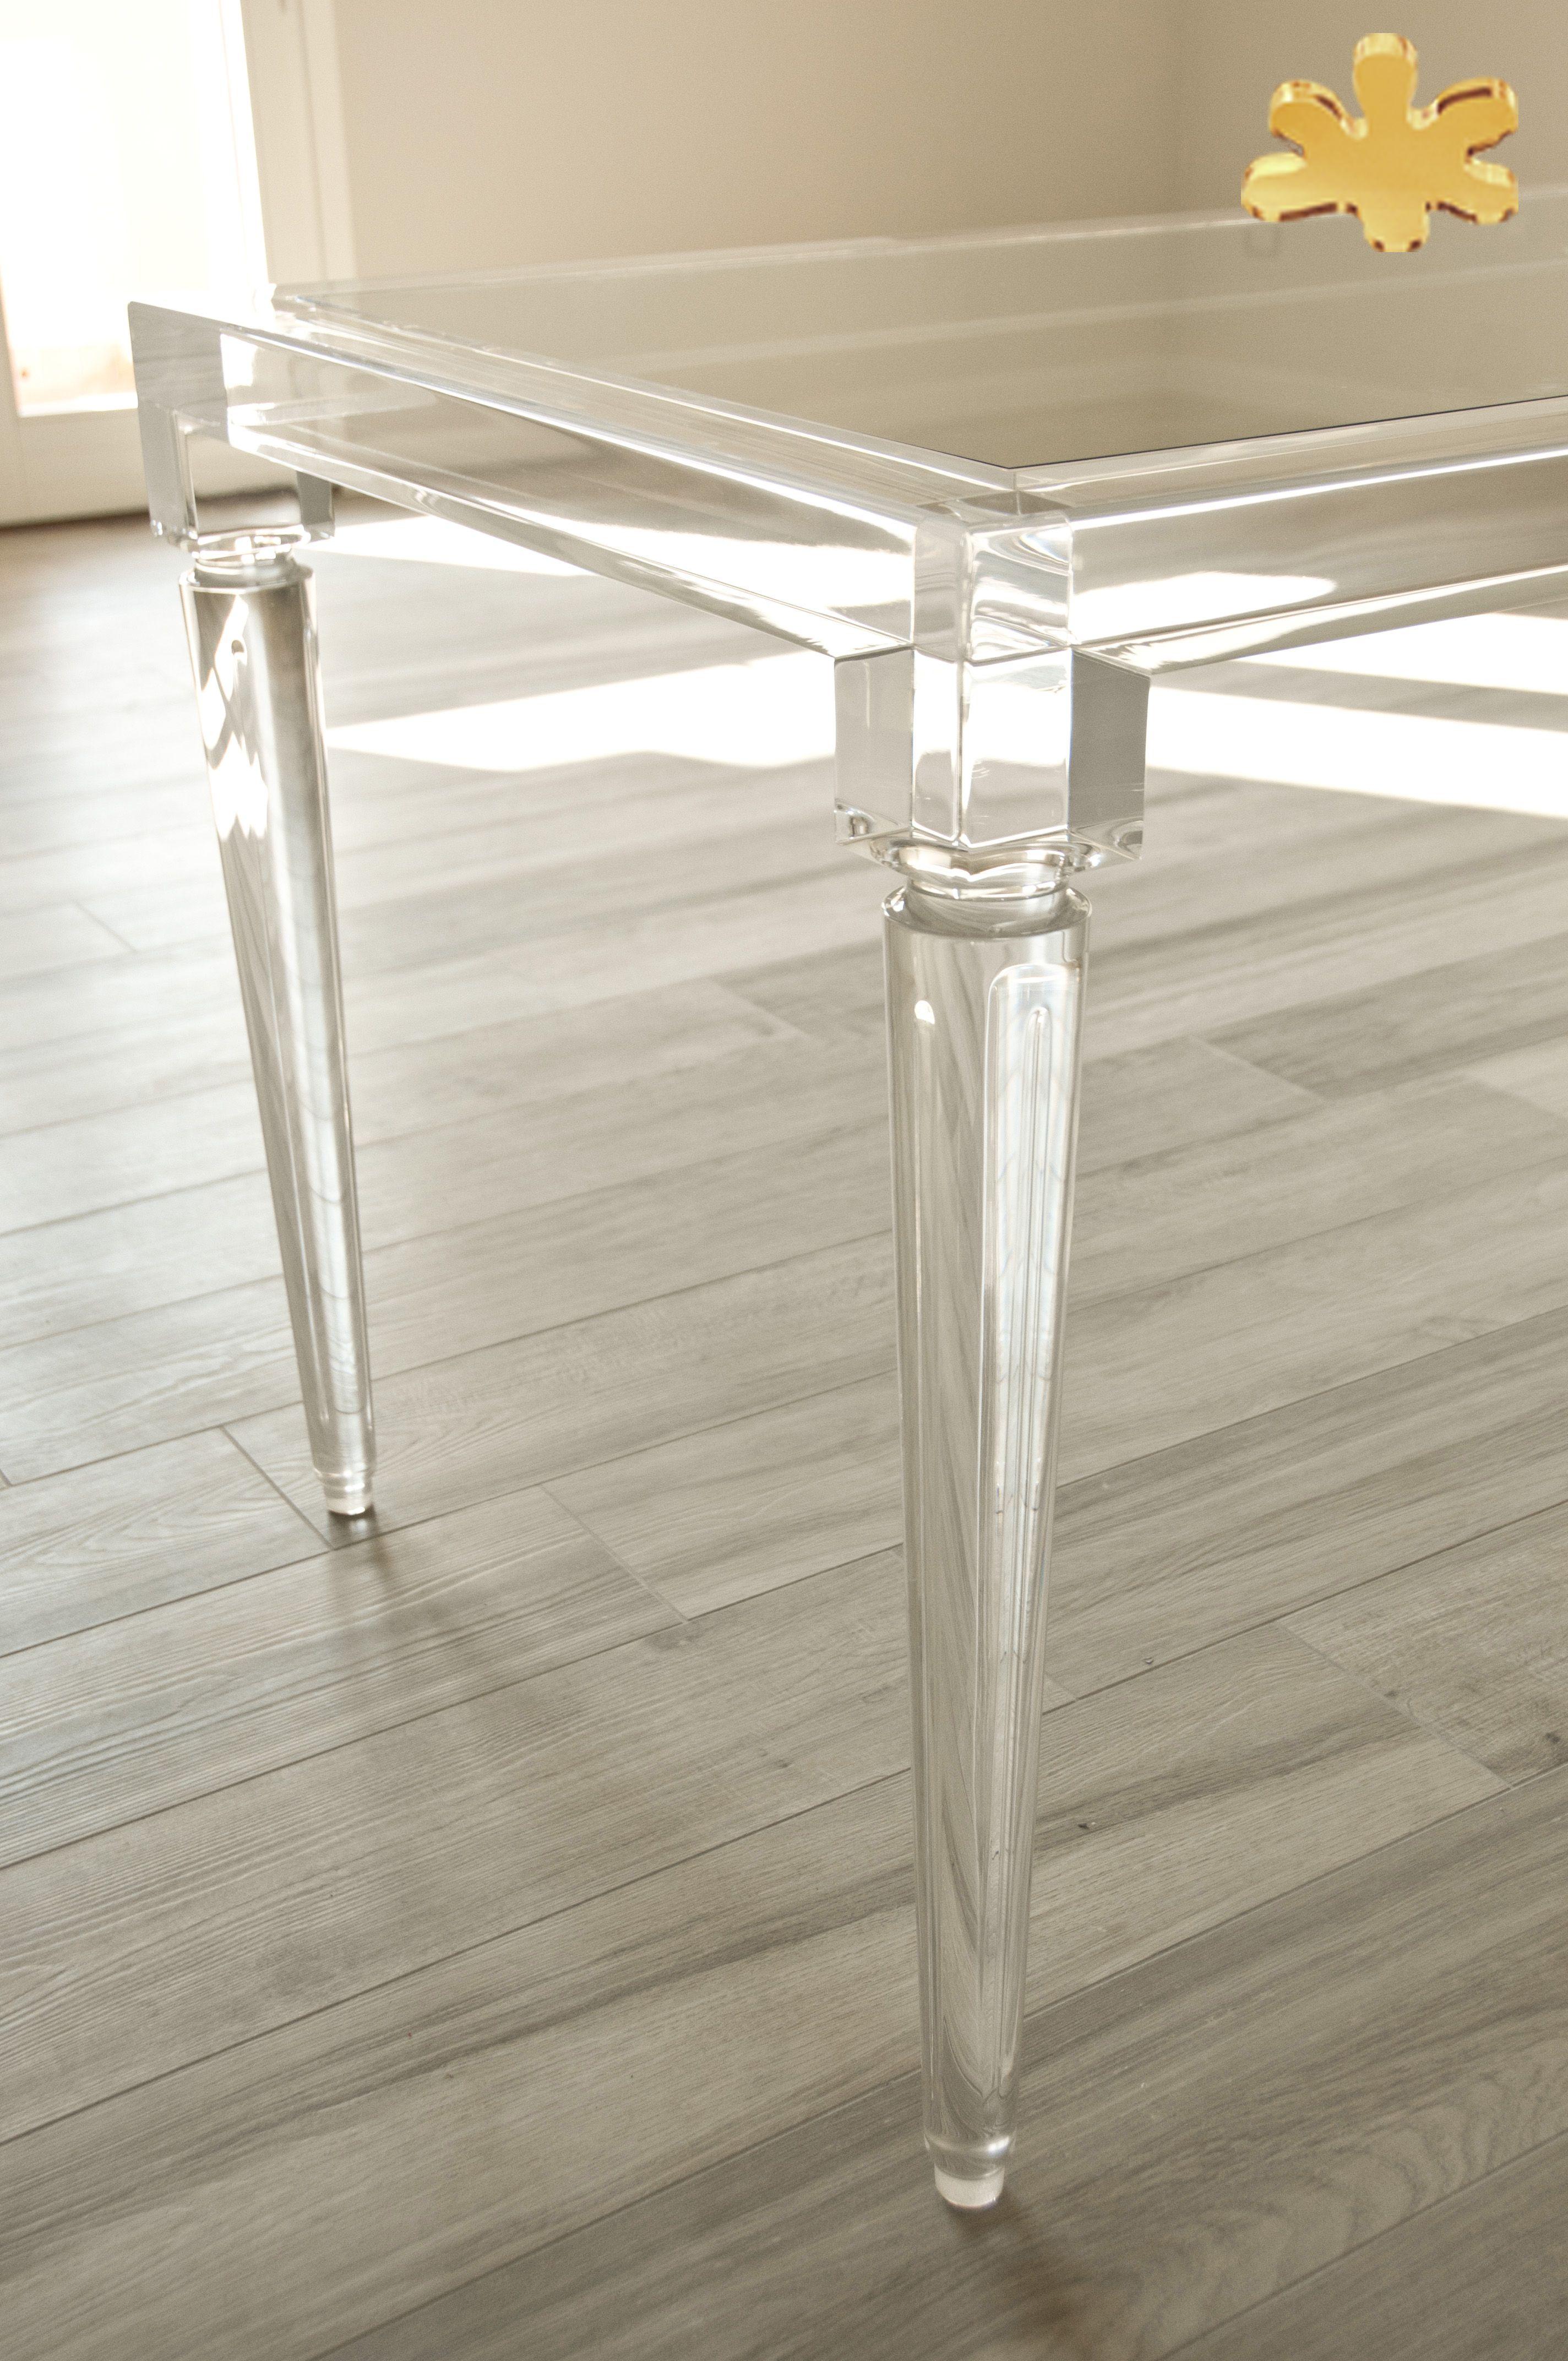 Acrylic Furniture   Lucite Acrylic Dining Table   TAVOLI PRANZO IN  PLEXIGLASS | Tavolo Trasparente In